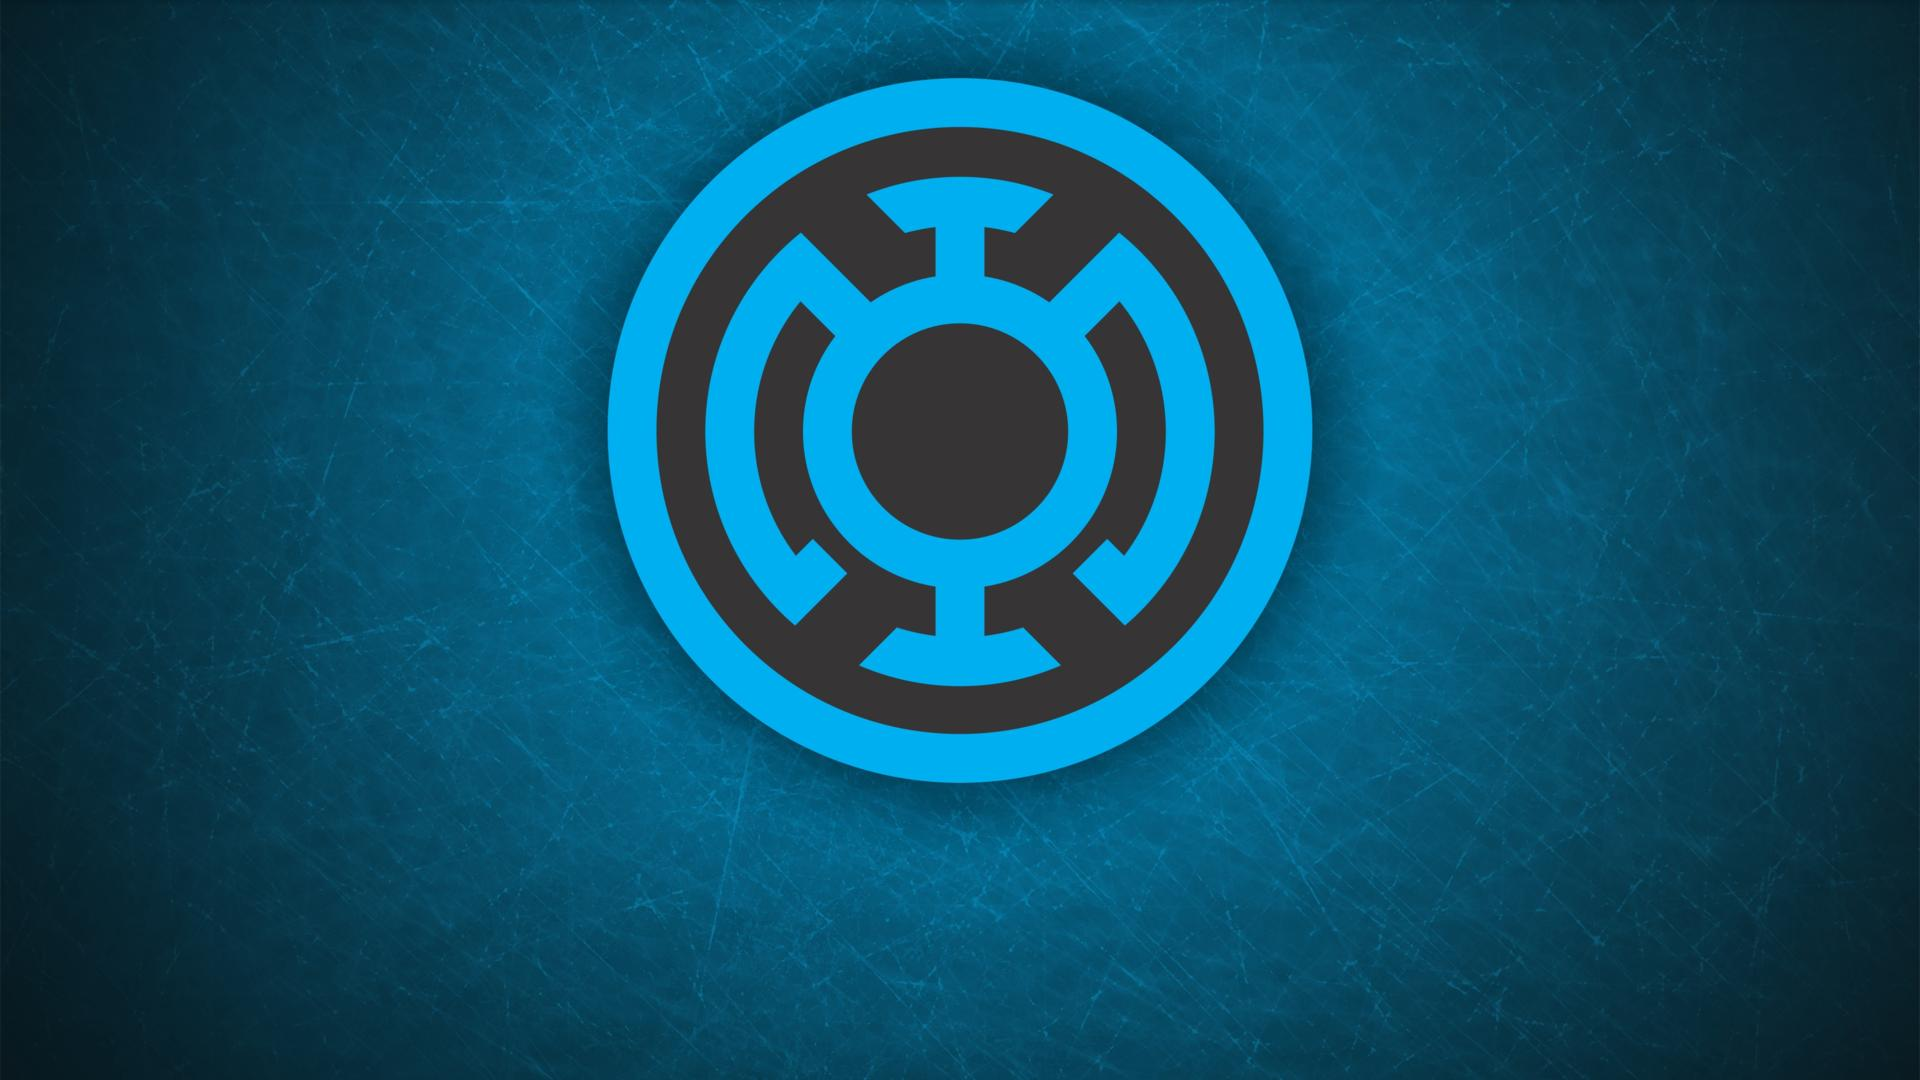 Blue Lantern Wallpapers Top Free Blue Lantern Backgrounds Wallpaperaccess